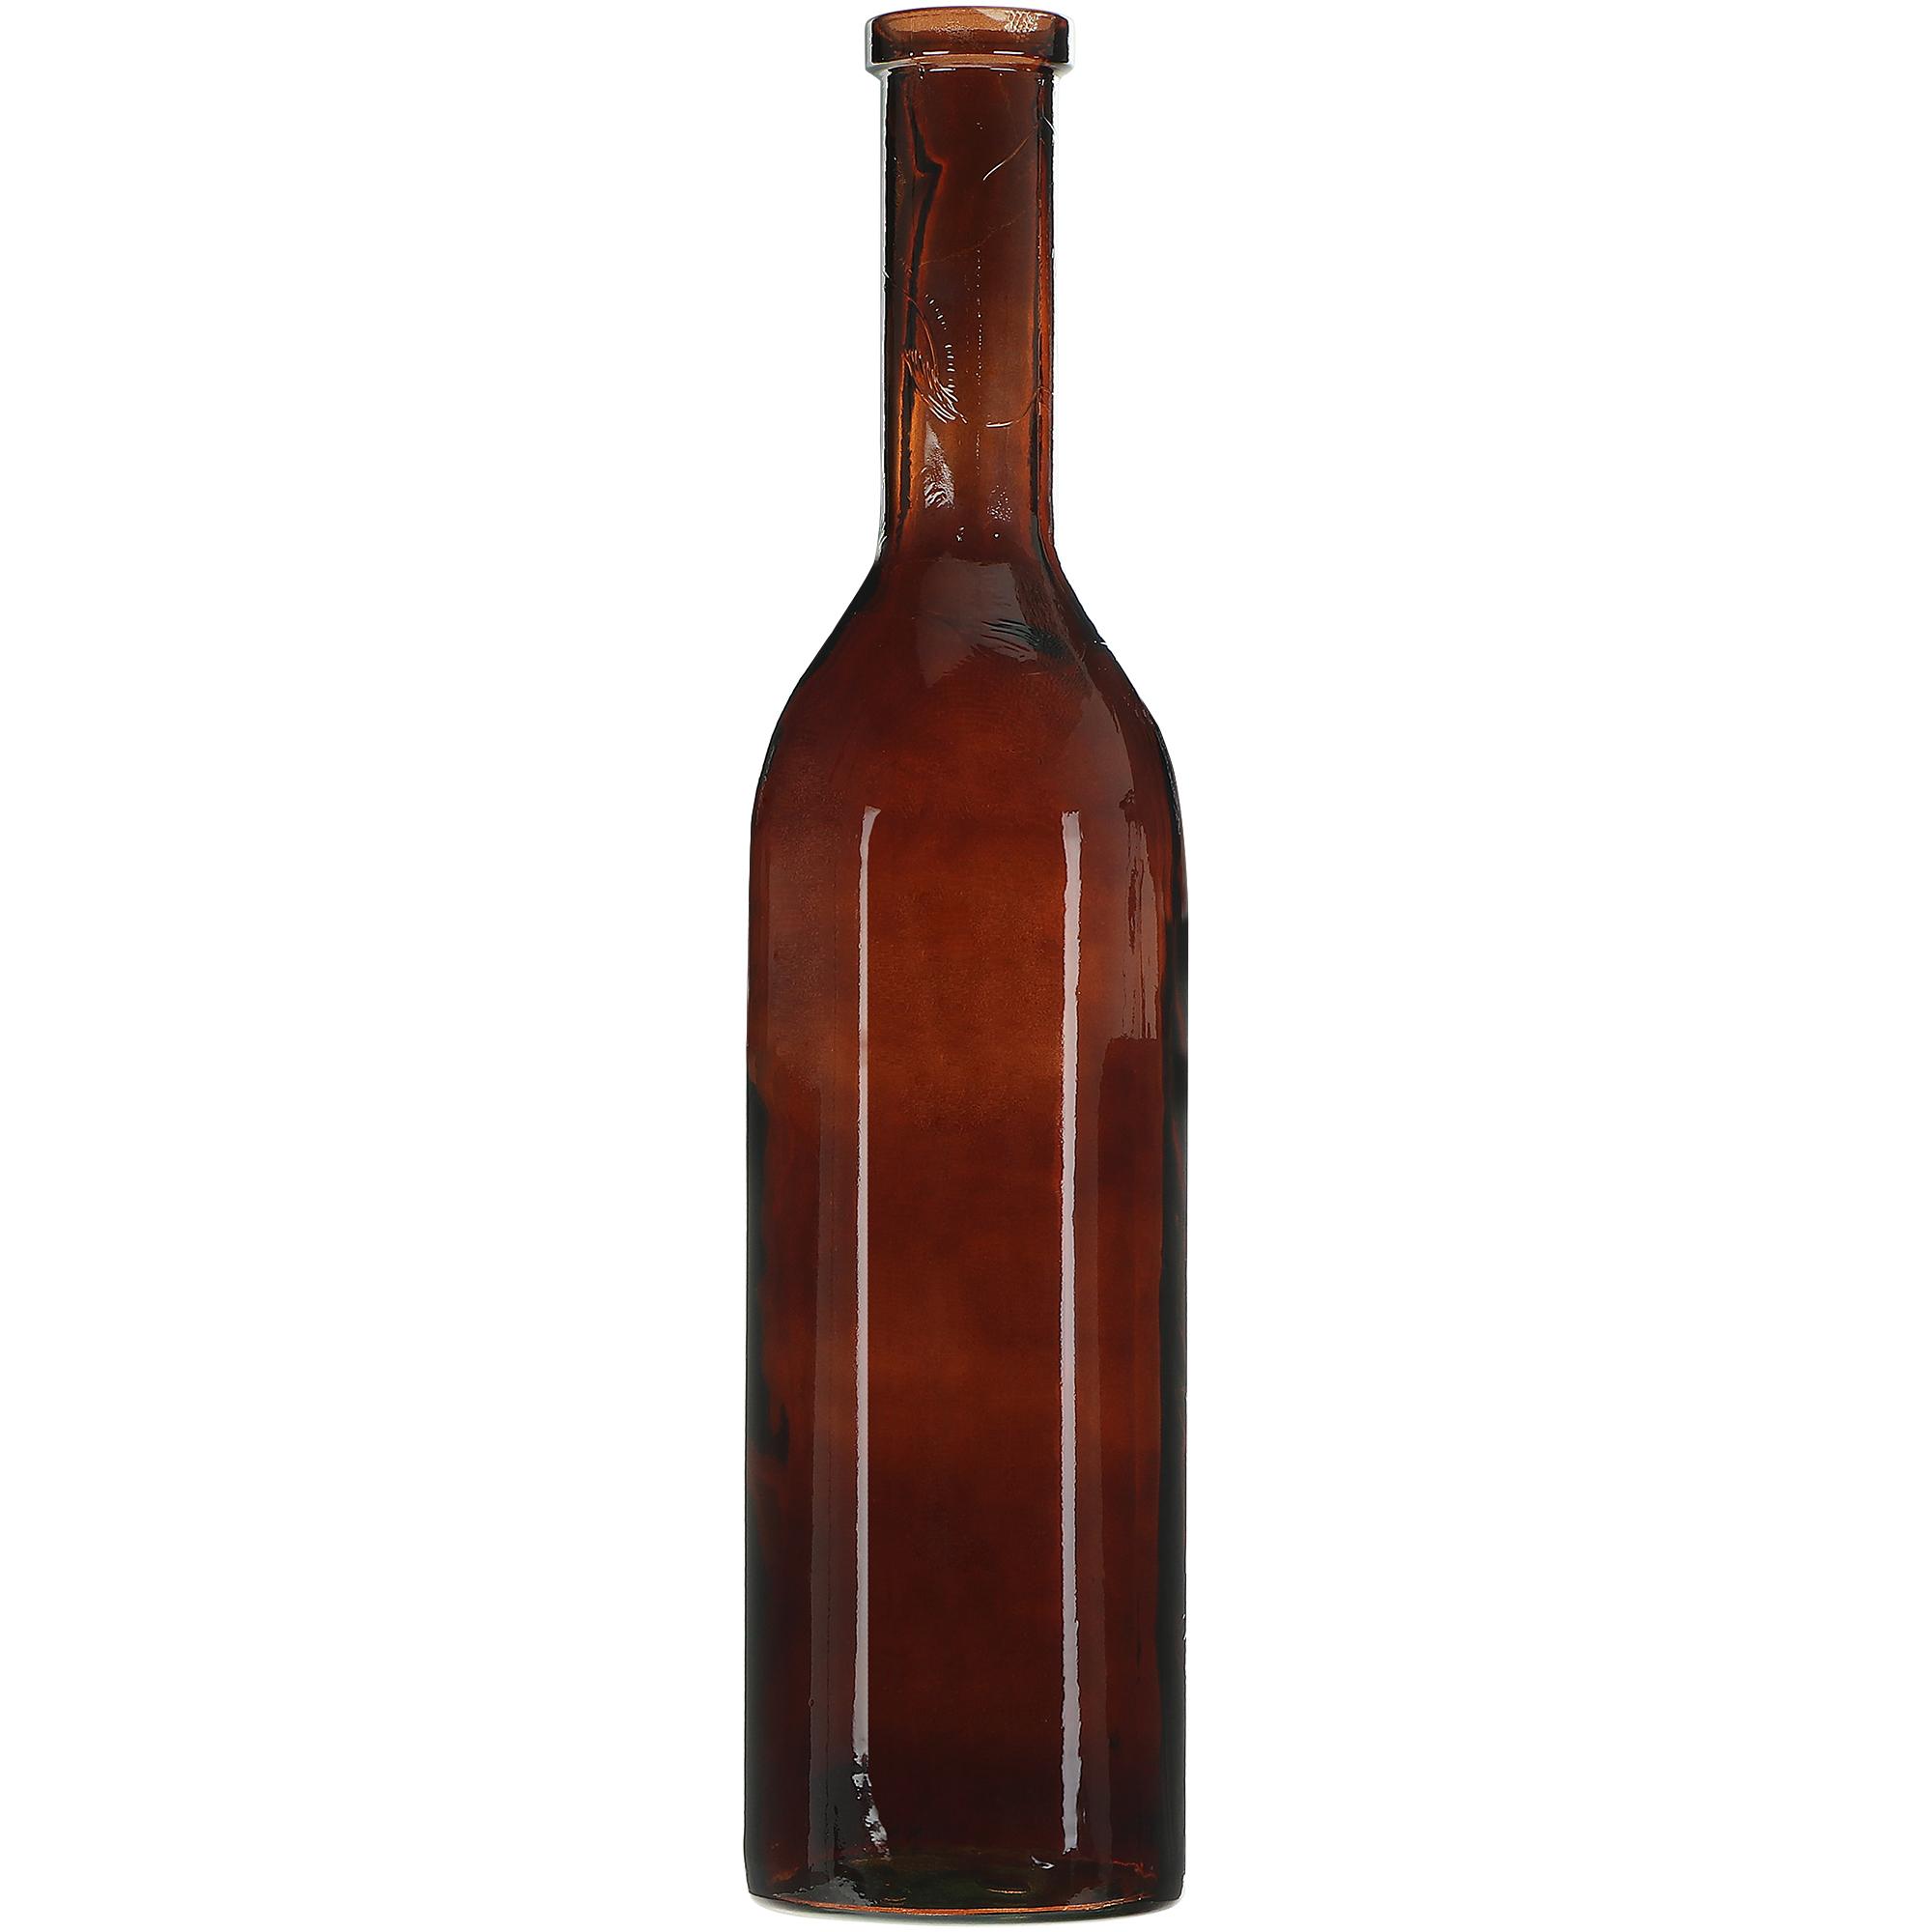 Ваза декоративная Kersten, 18х18х75 см ваза декоративная kersten 18х18х80 см